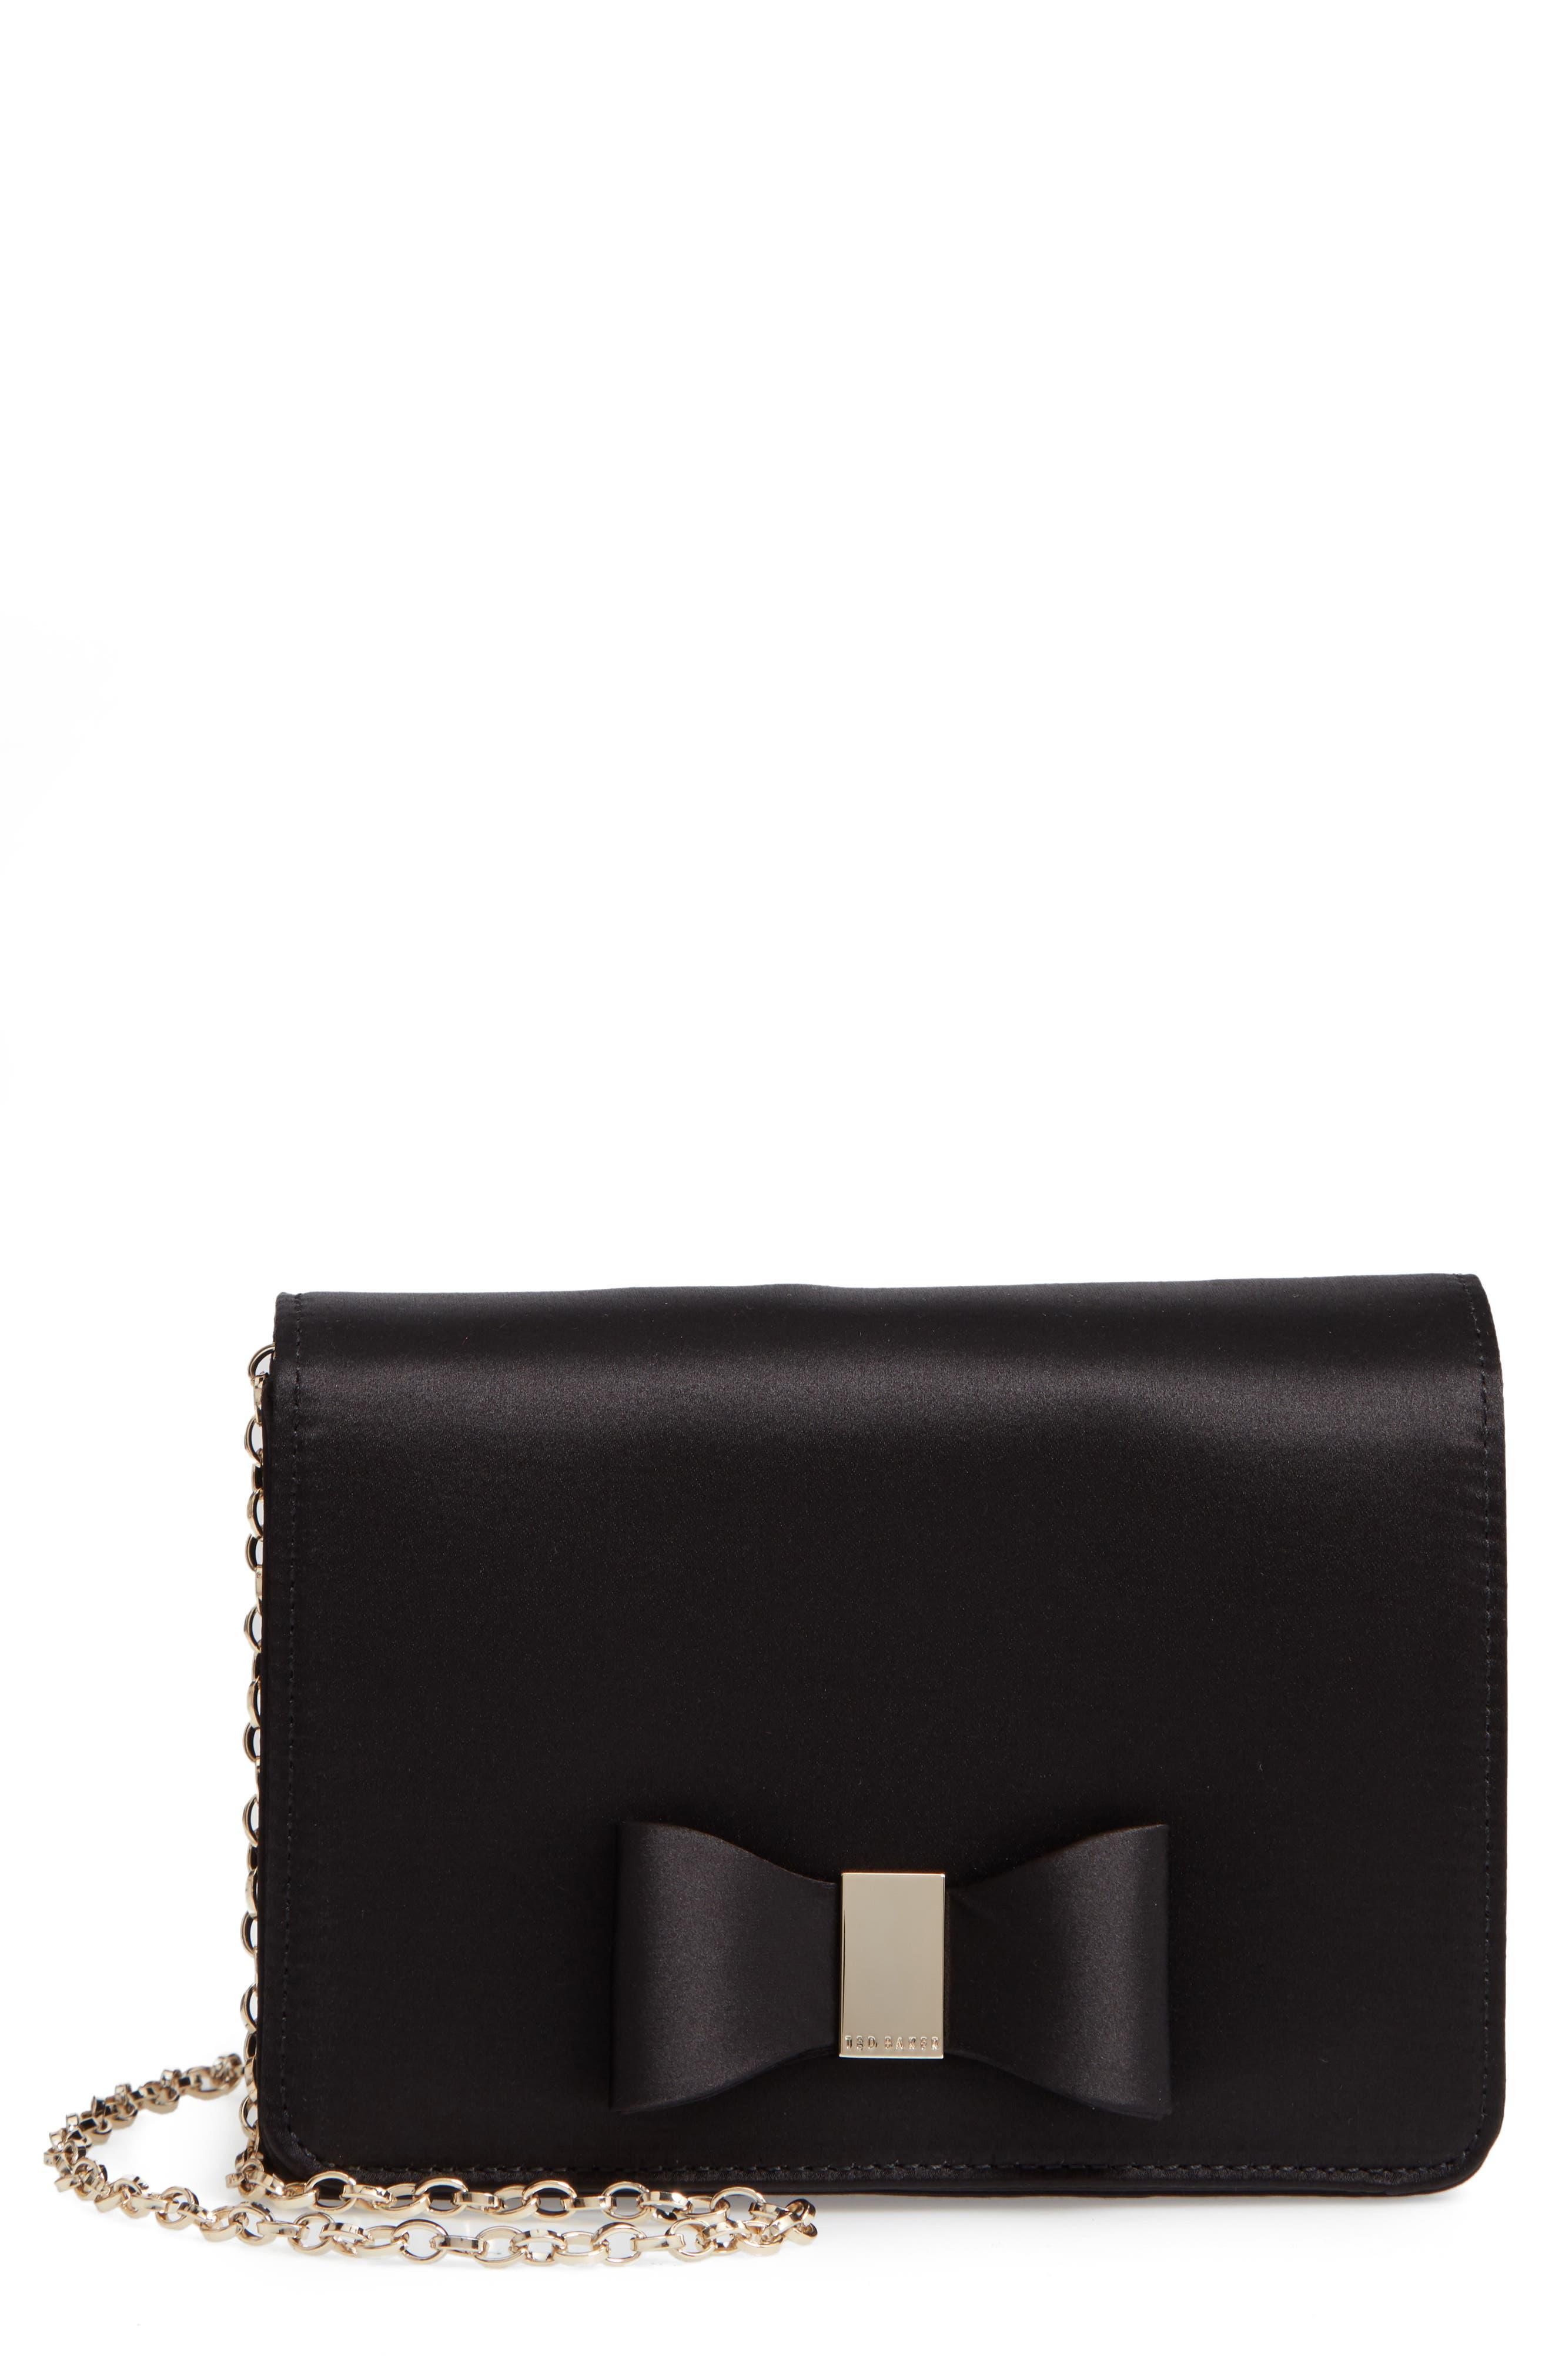 Eveelyn Bow Satin Evening Bag,                             Main thumbnail 1, color,                             BLACK